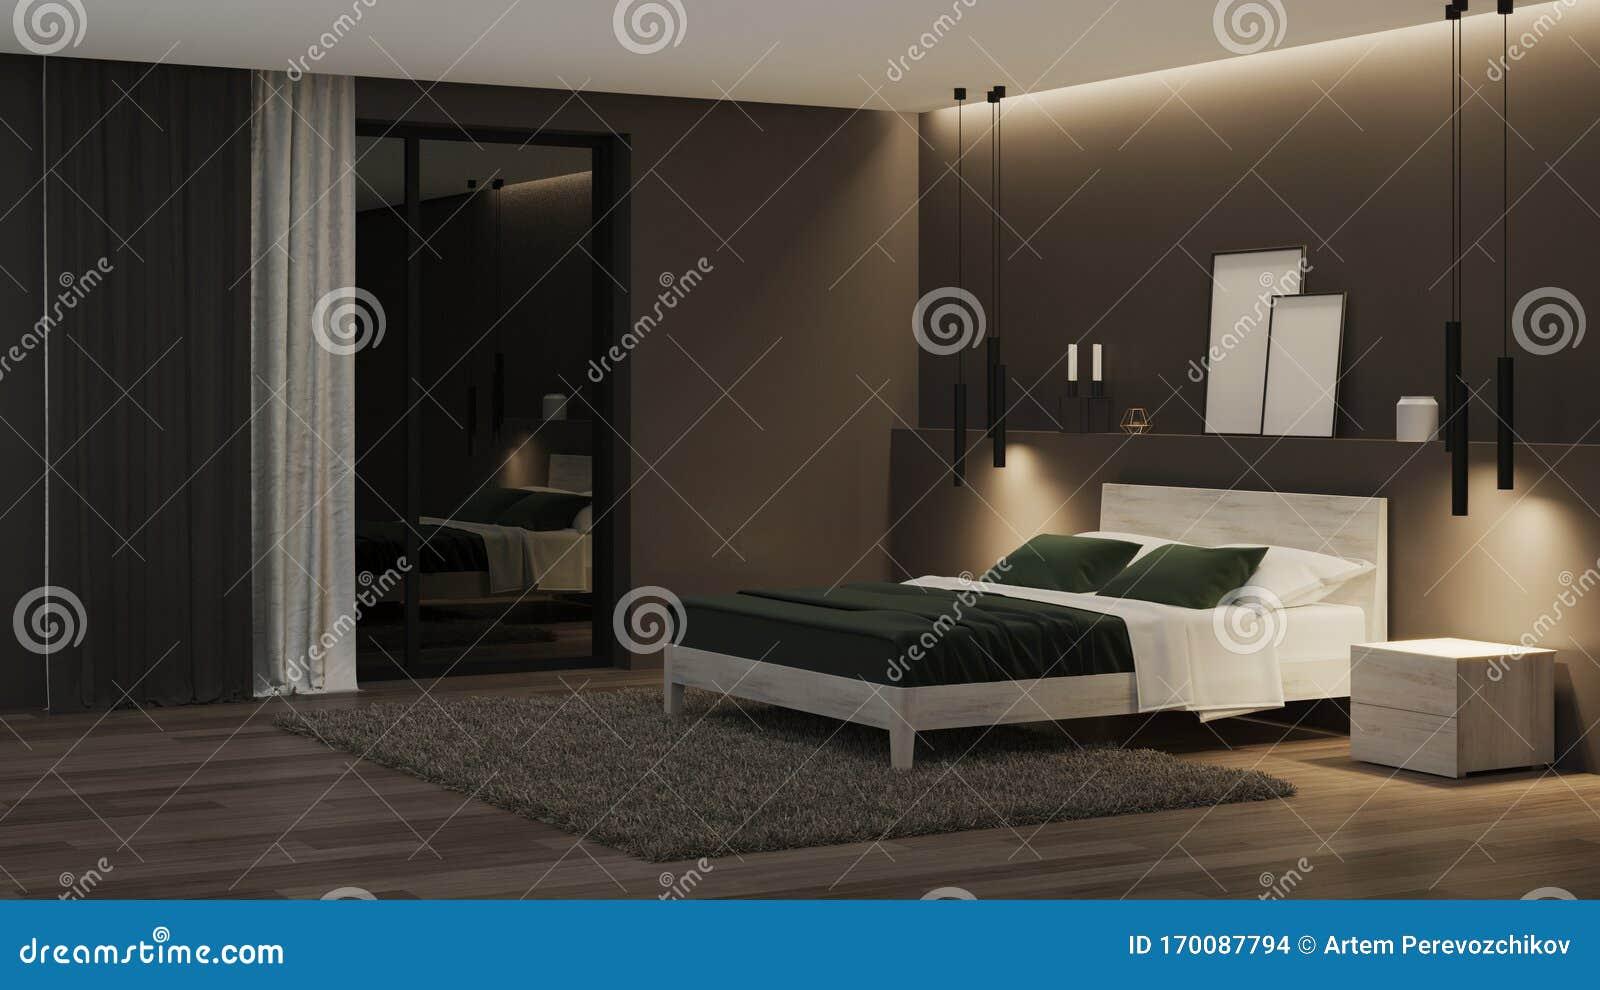 Modern House Interior Bedroom With Dark Walls And Bright Furniture Night Evening Lighting Stock Illustration Illustration Of Dark Comfortable 170087794